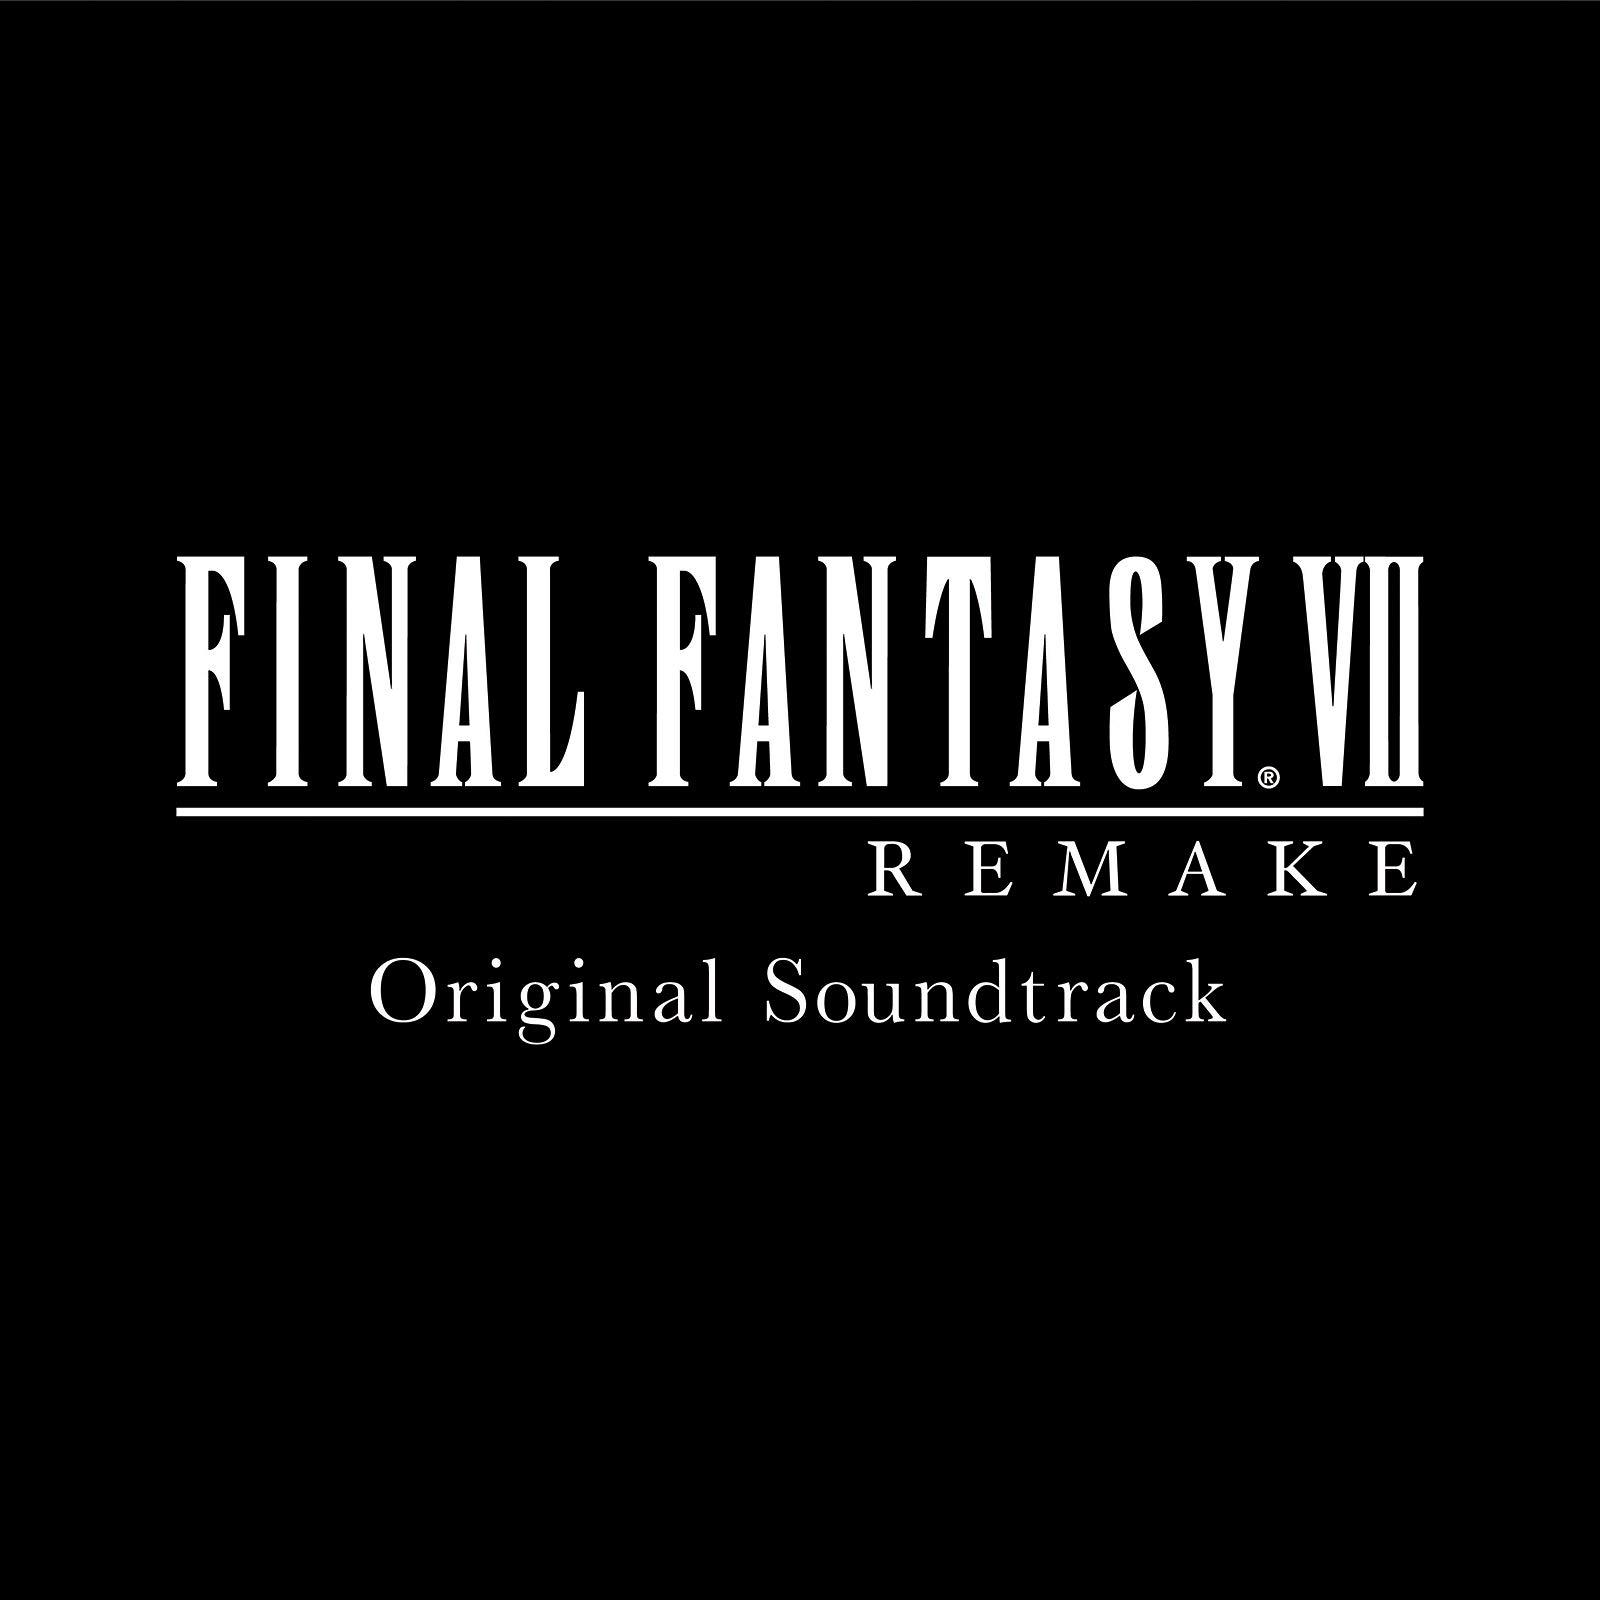 VA - Final Fantasy VII Remake Original Soundtrack (2020) [FLAC] Download